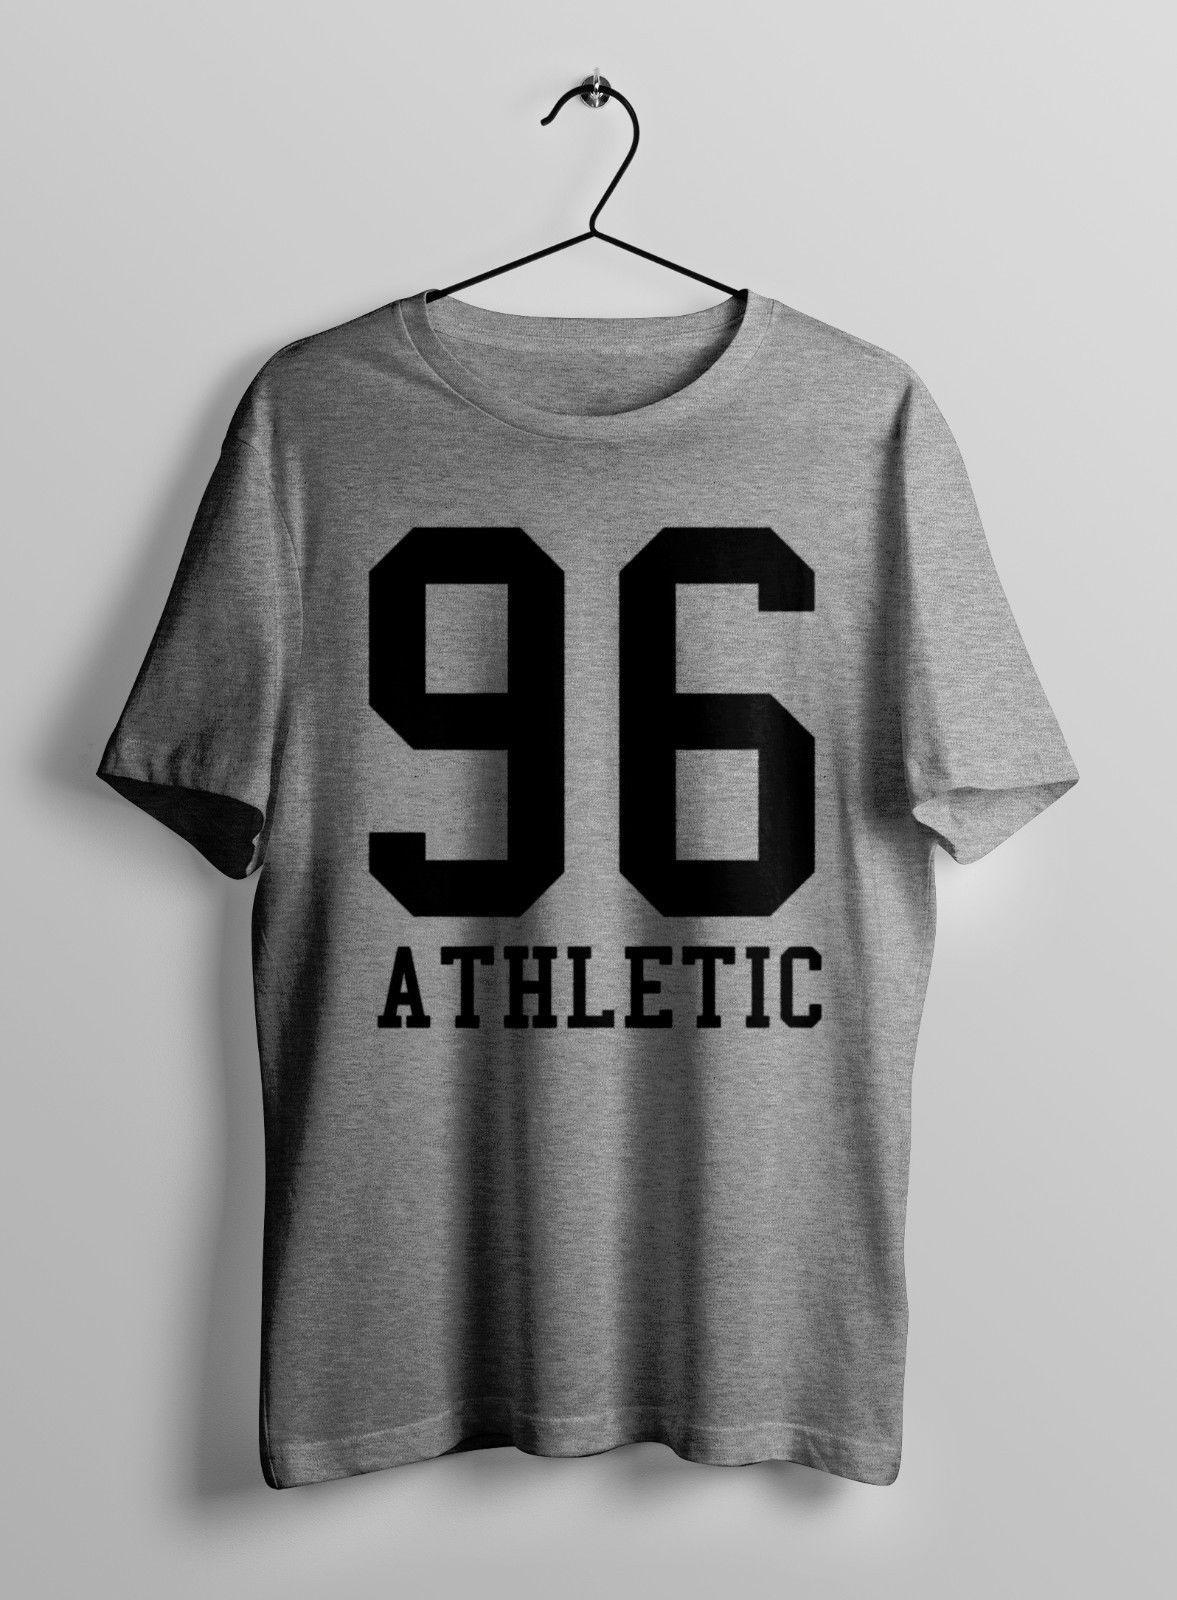 T-Shirt Men Kurzarm Lustige 96 LEICHTATHLETIK Fettdruck RETRO Turnhallen TRAINING TOP UNISEX-T-SHIRT T-SHIRT T-S-XXL Männer-Sommer-Art